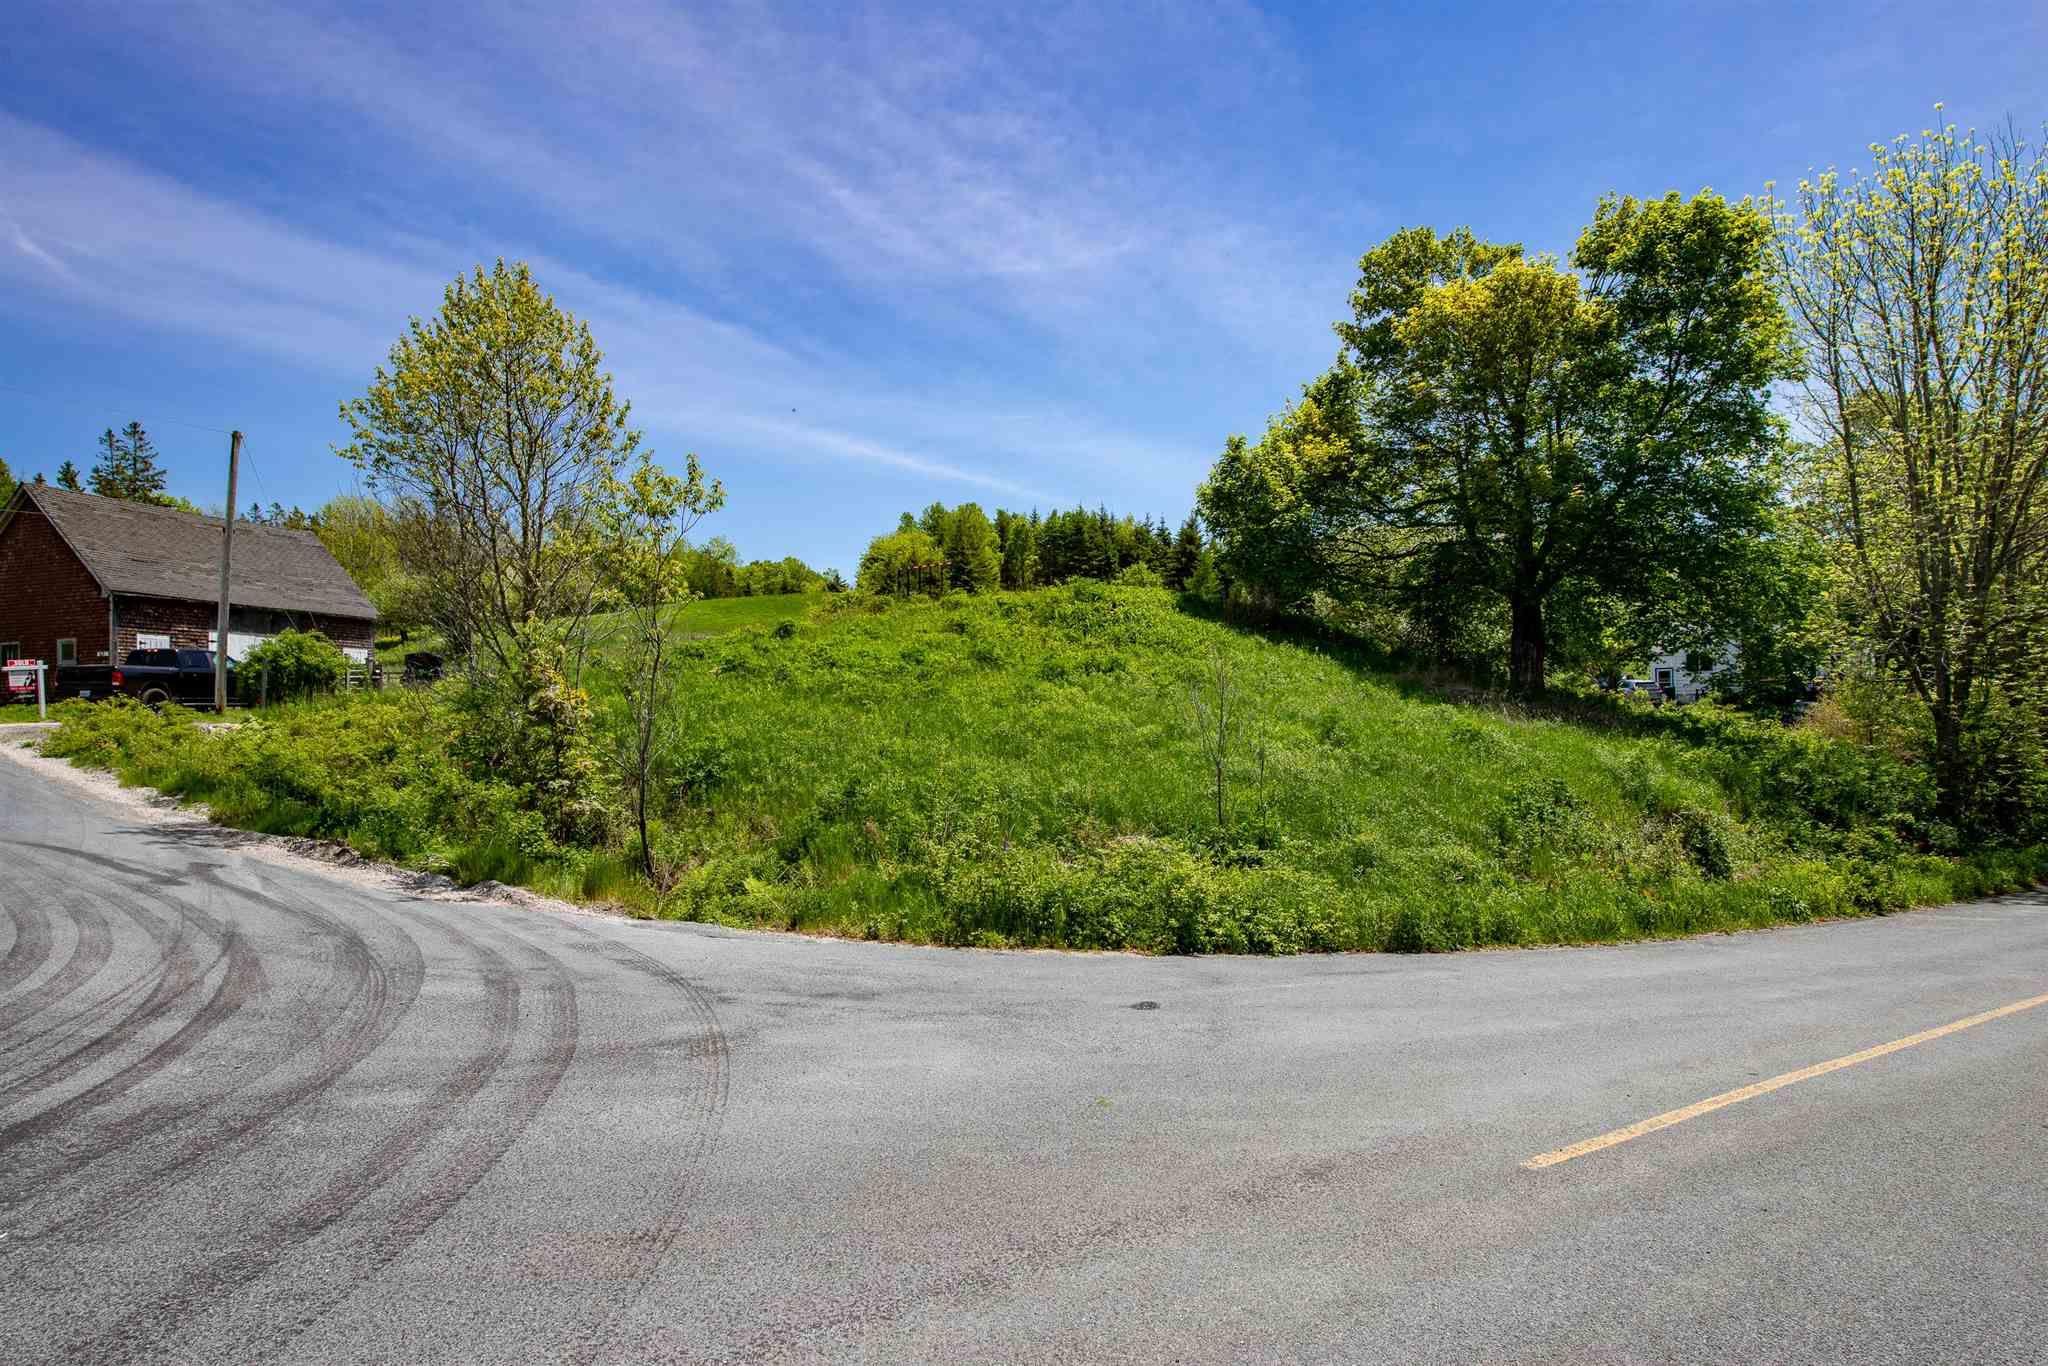 Main Photo: 48 Dauphinees Loop in Glen Haven: 40-Timberlea, Prospect, St. Margaret`S Bay Vacant Land for sale (Halifax-Dartmouth)  : MLS®# 202114826